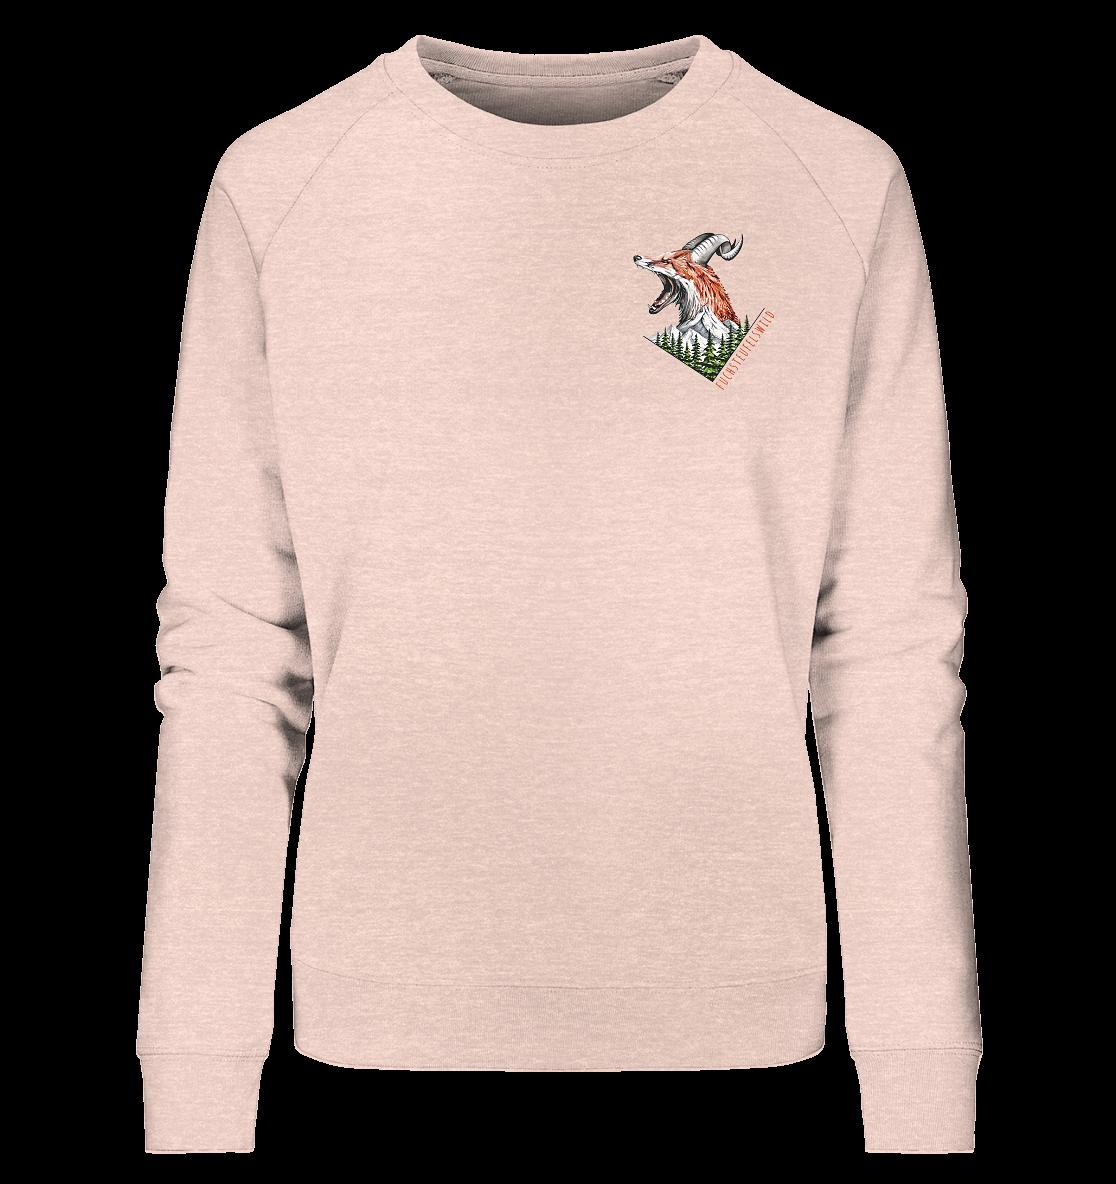 front-ladies-organic-sweatshirt-ffded6-1116x-2.png